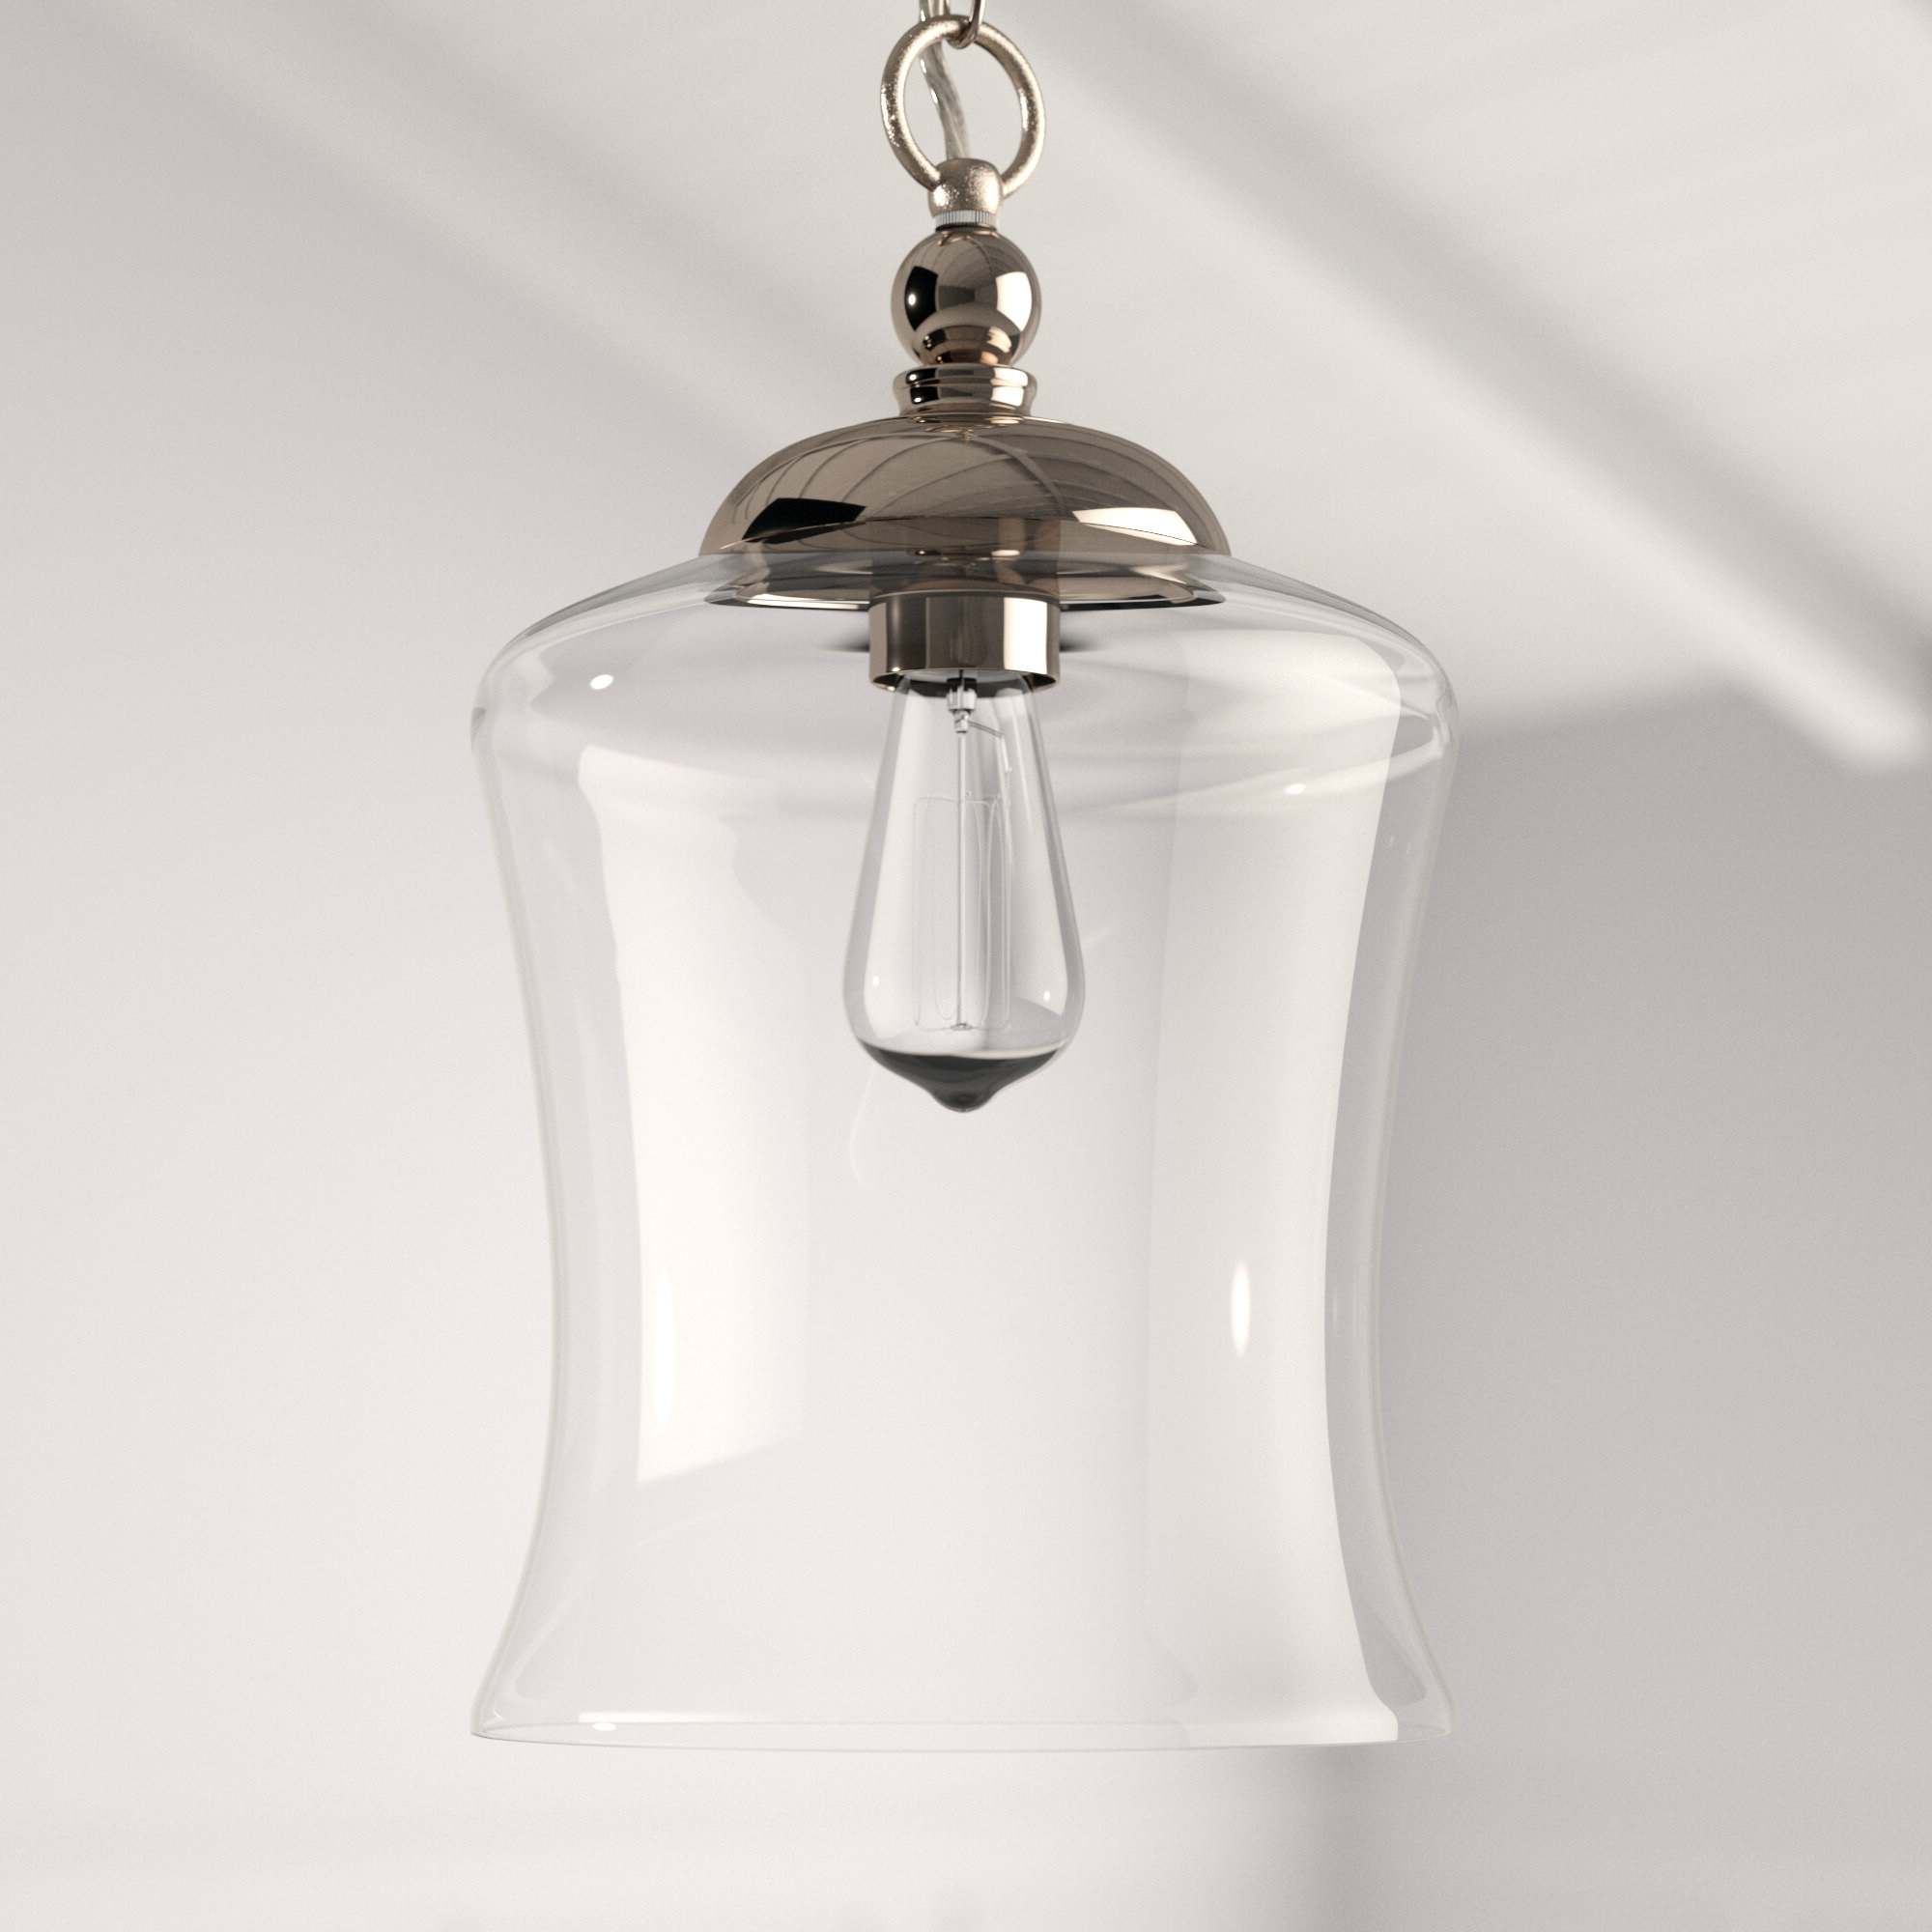 Wentzville 1 Light Single Bell Pendant Pertaining To Fashionable Sussex 1 Light Single Geometric Pendants (View 23 of 25)